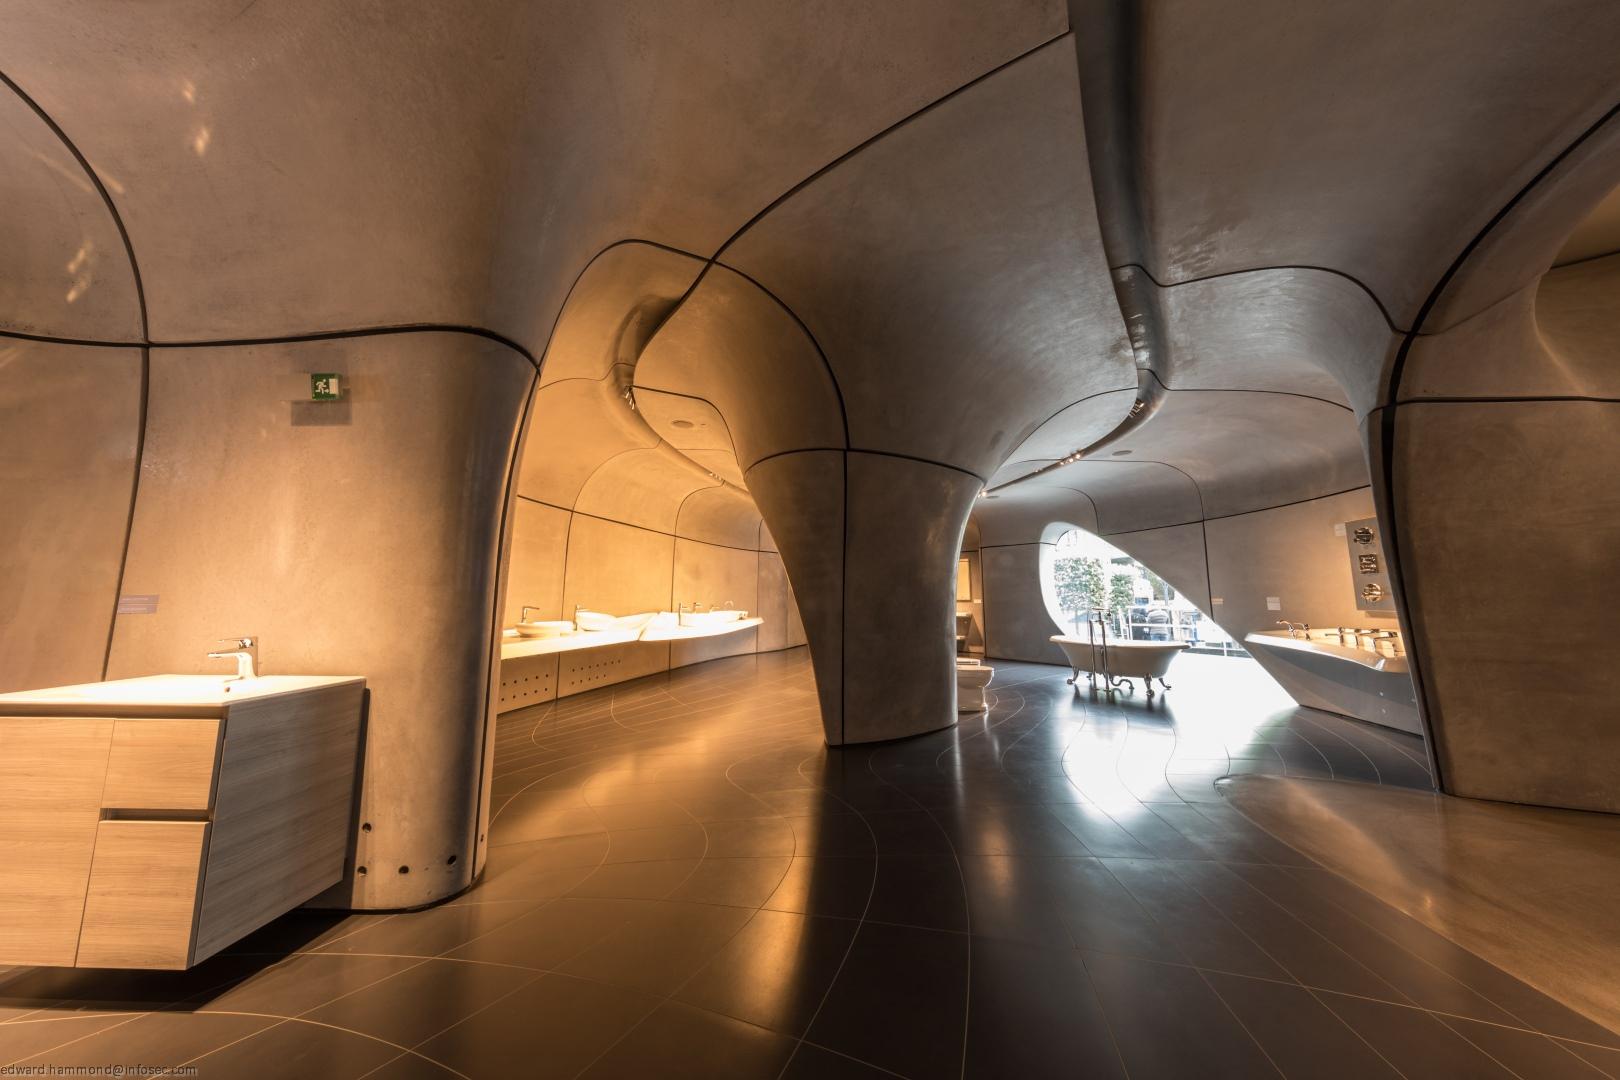 Roca London Gallery, United Kingdom